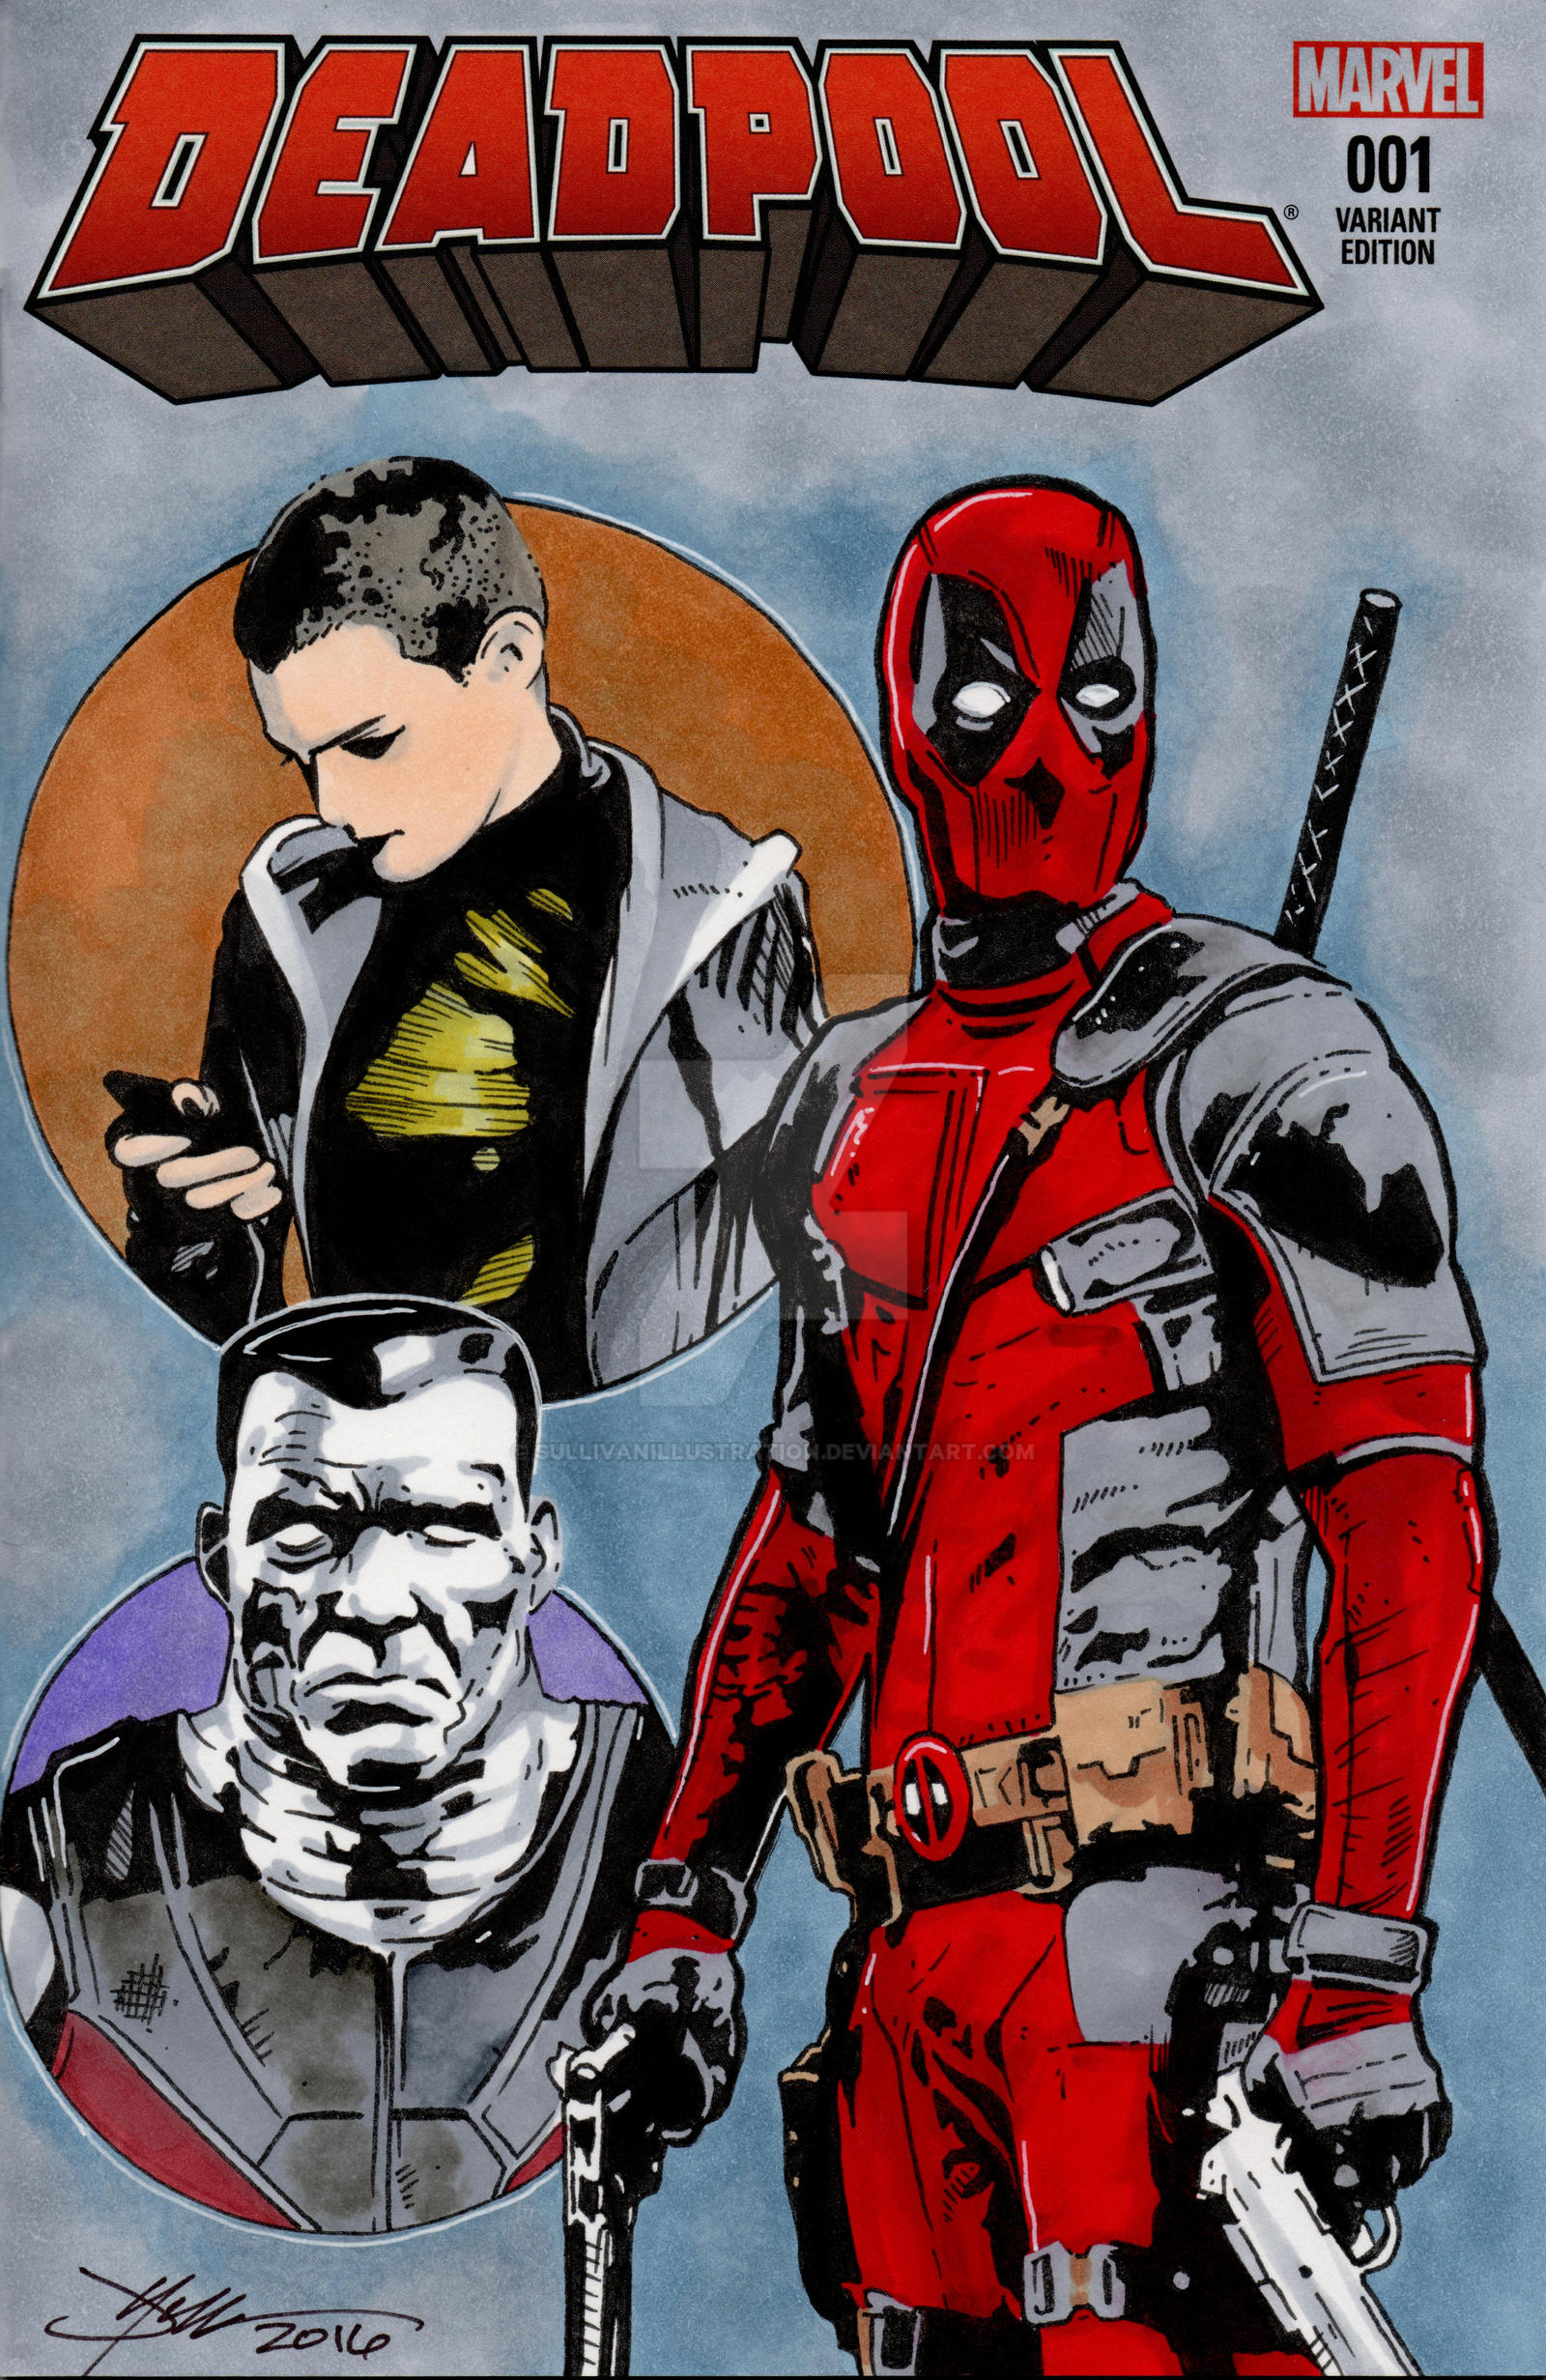 Deadpool Movie Hand Drawn Sketch Cover by sullivanillustration